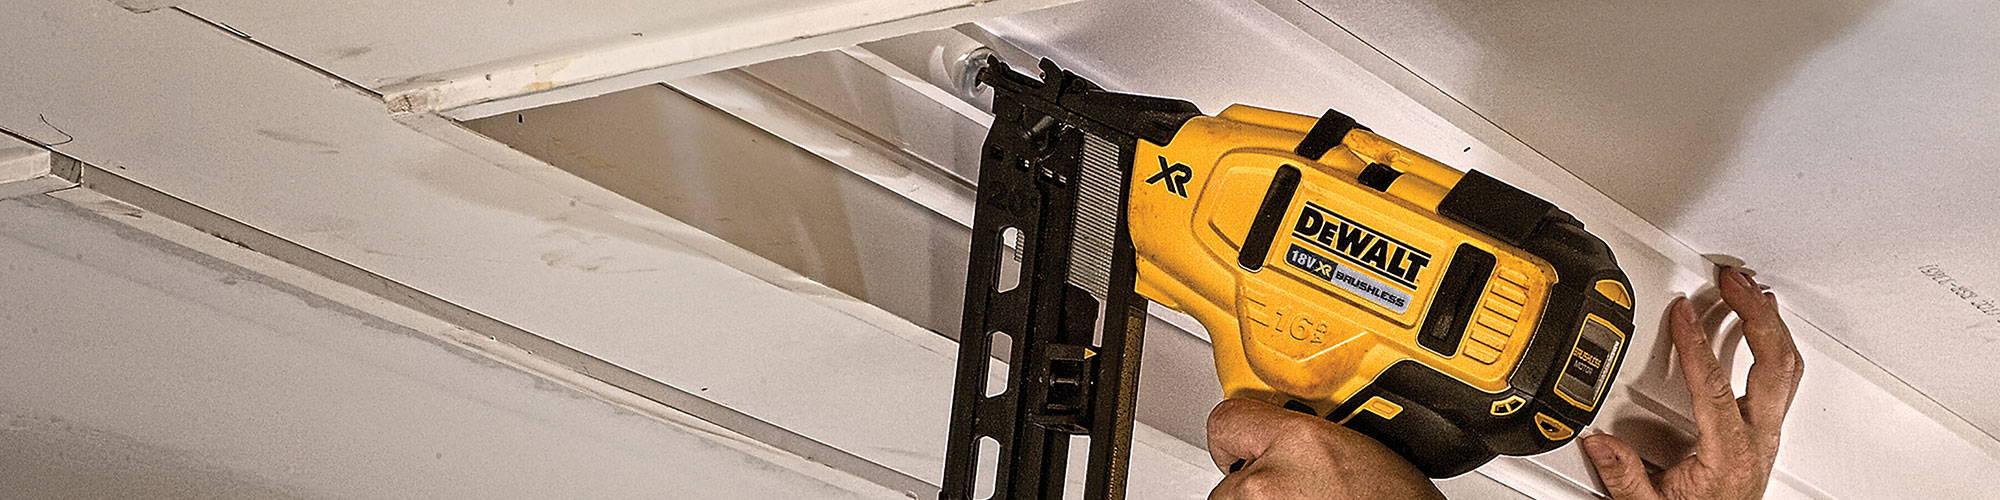 DCN660 Dewalt 2nd Fix Nail Gun Review